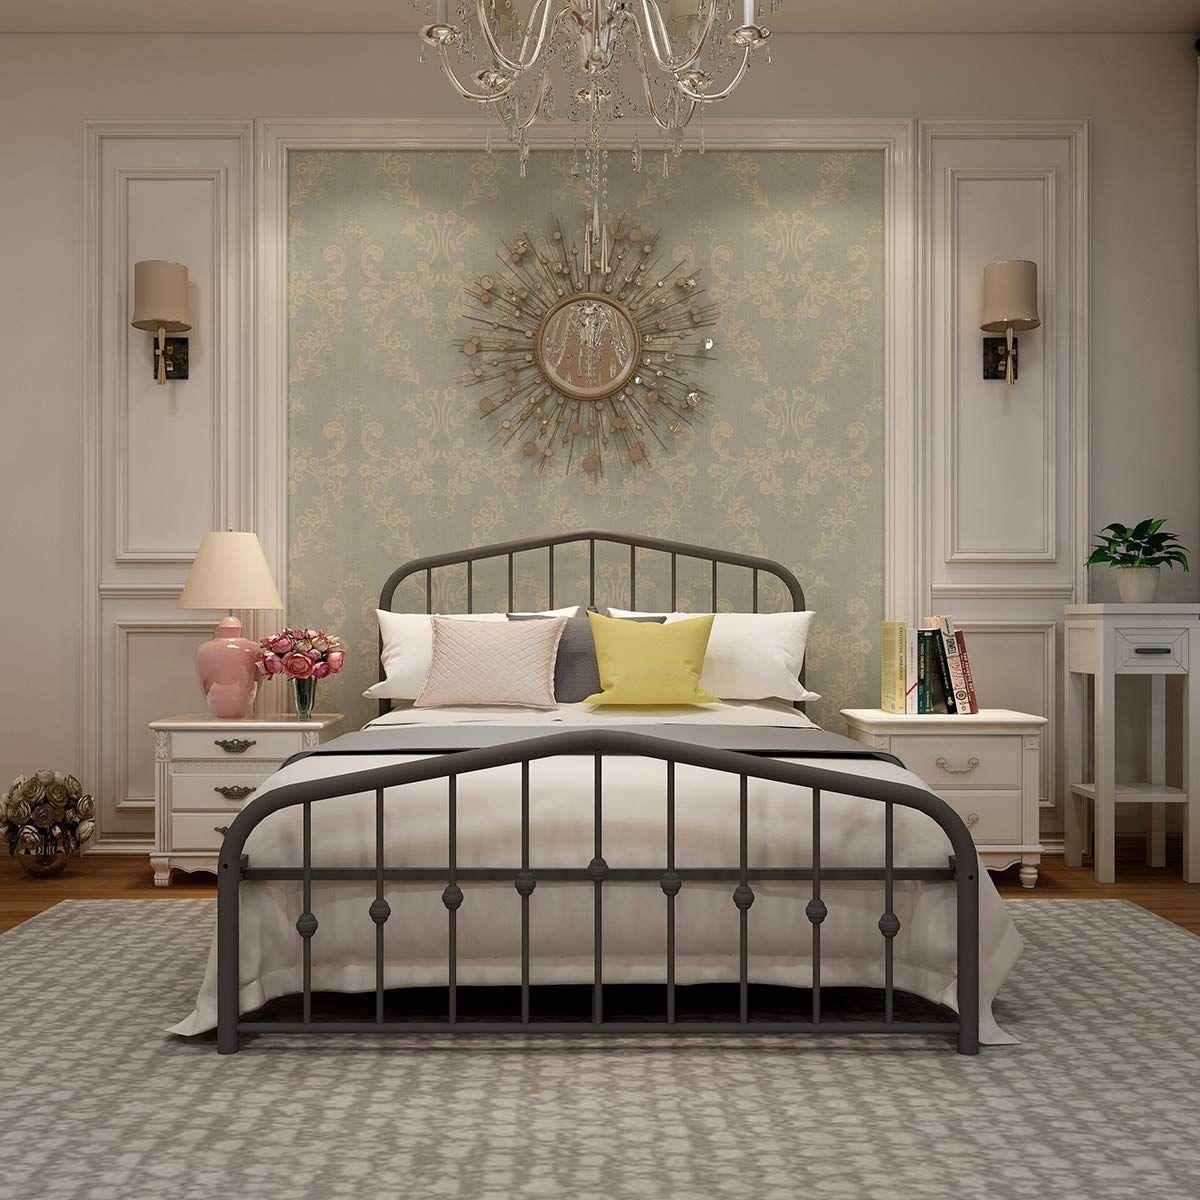 Metal Bed Frame Full Size Platform No Box Spring Needed